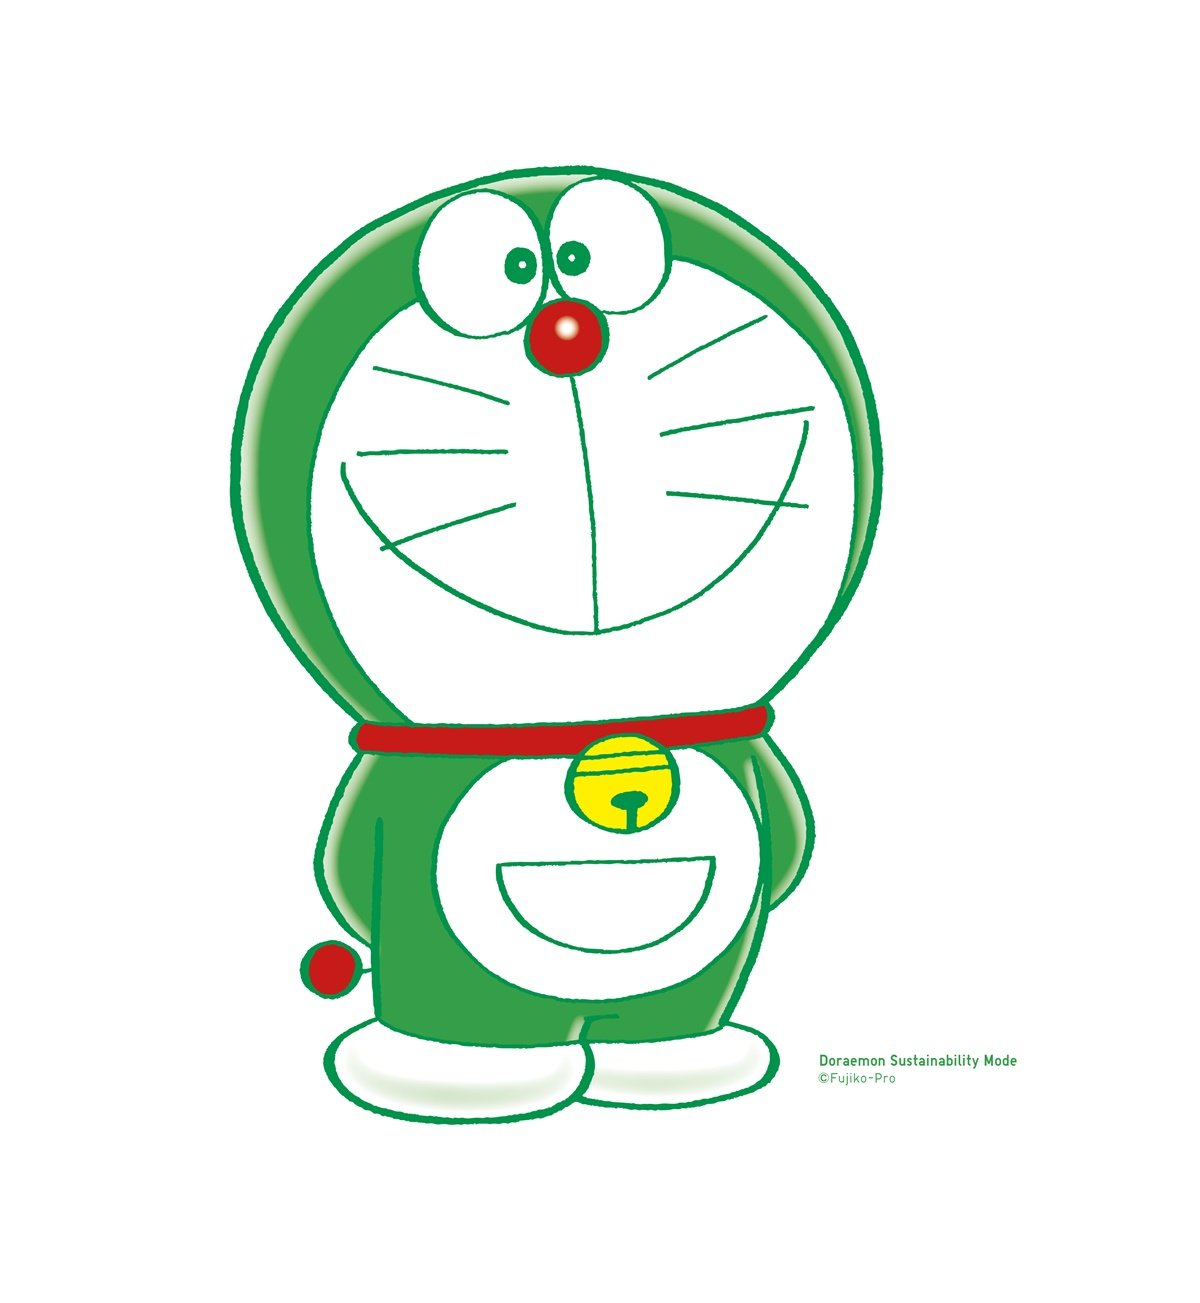 Doraemon Sustainability Mode_EN